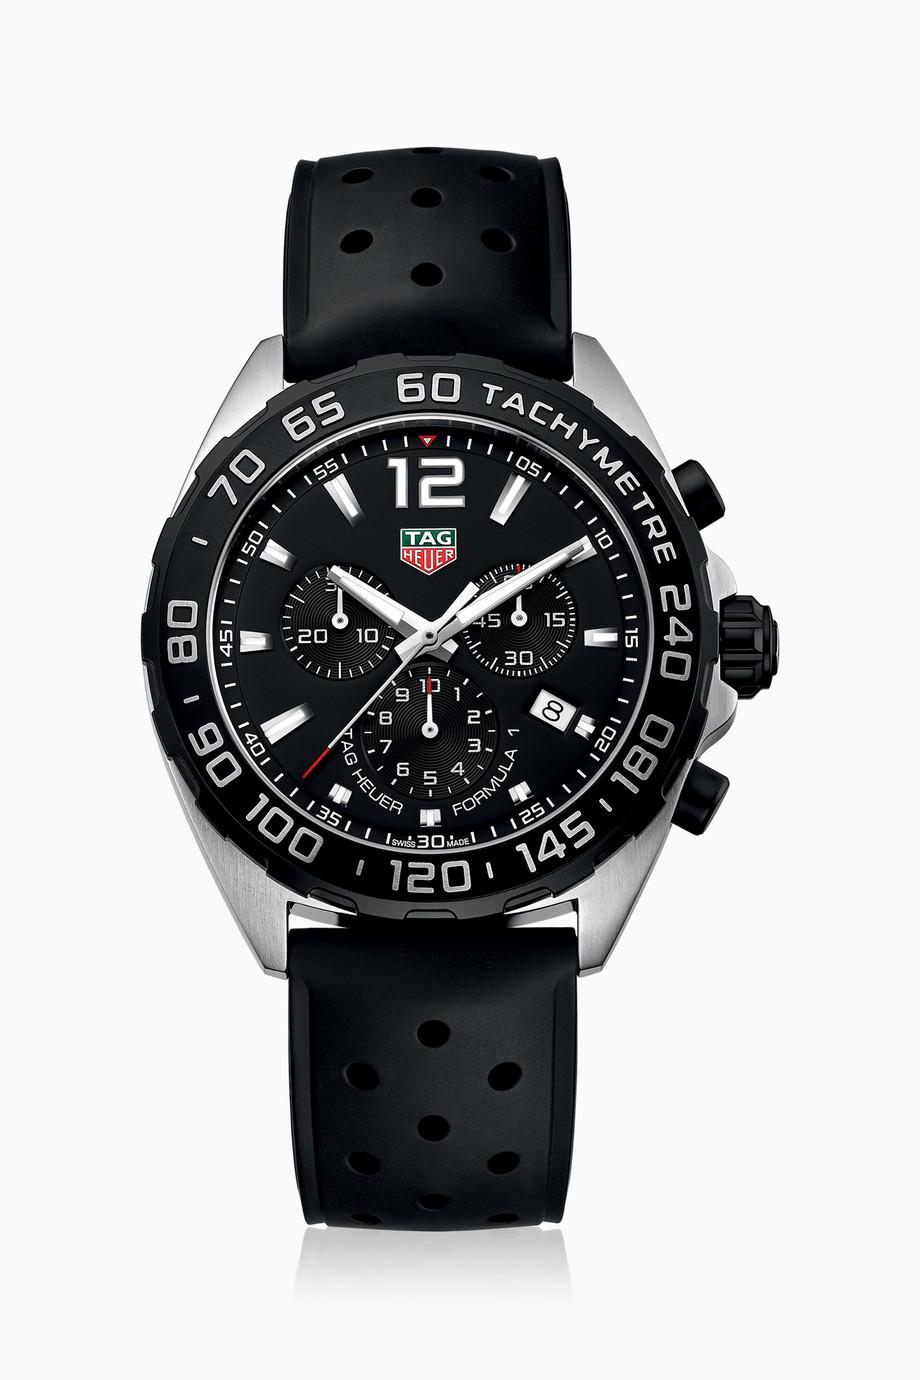 6abbbab14 تسوق ساعة كوارتز كرونوغراف فورمولا 1 TAG Heuer أسود للرجال   اُناس ...